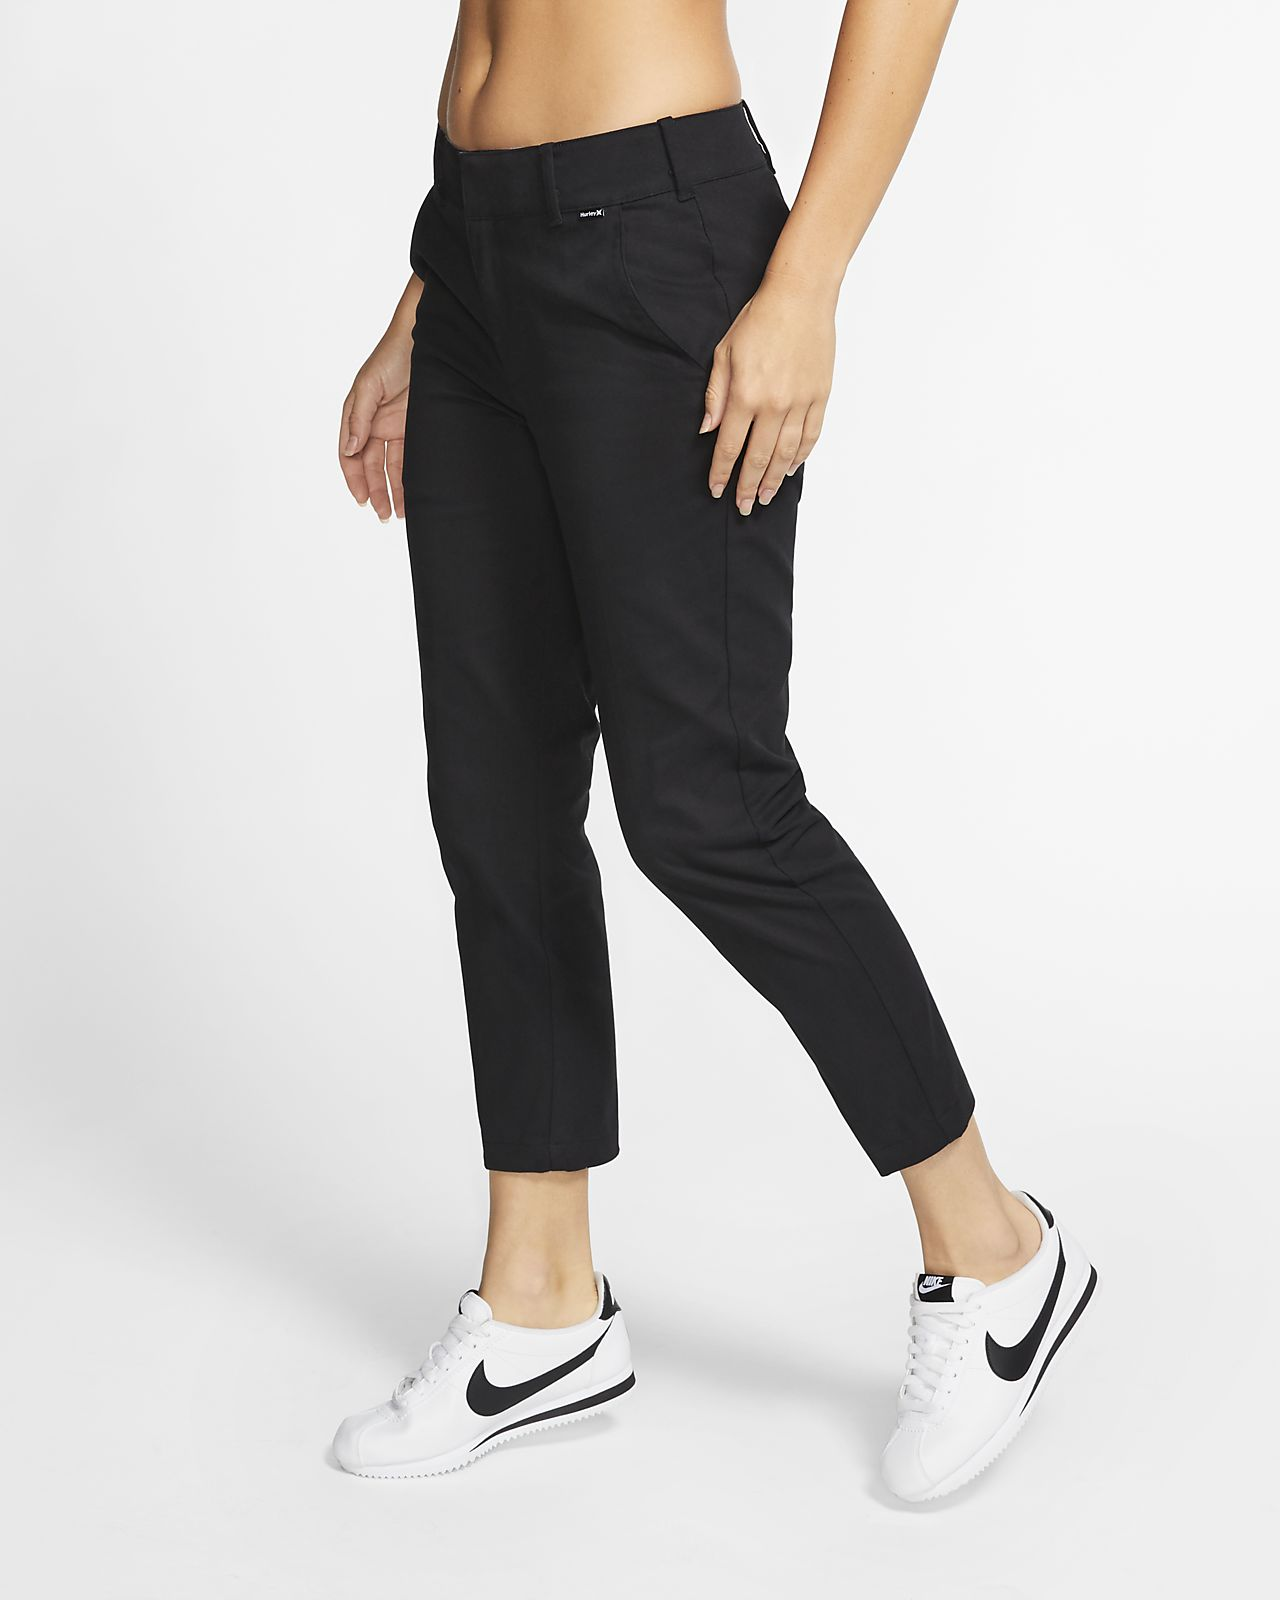 Hurley Lowrider Pantalons xinesos - Dona